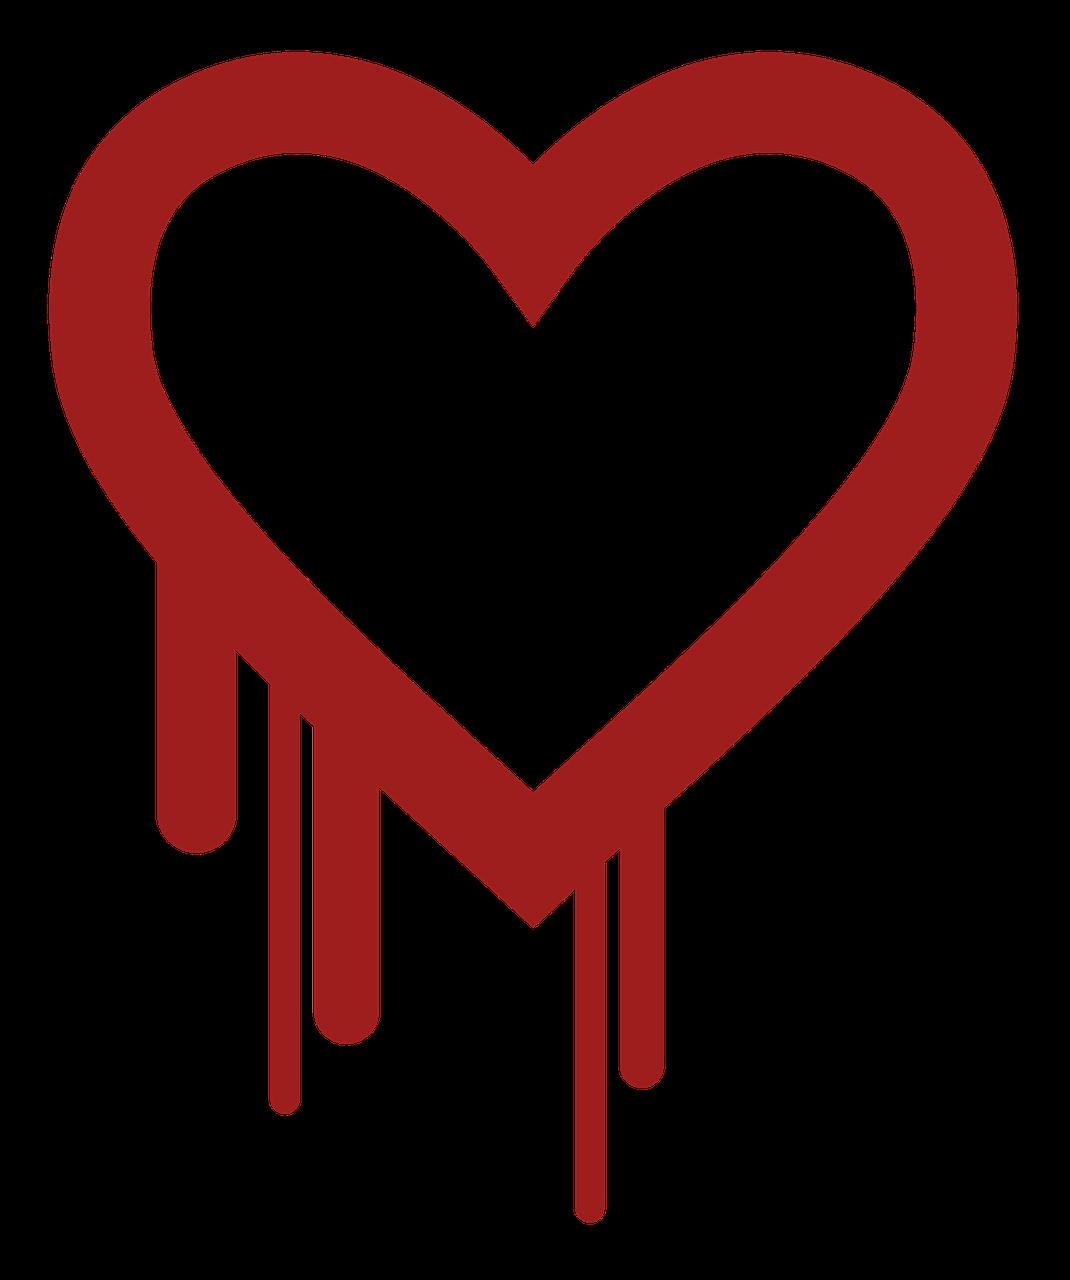 heart-1179068_1280